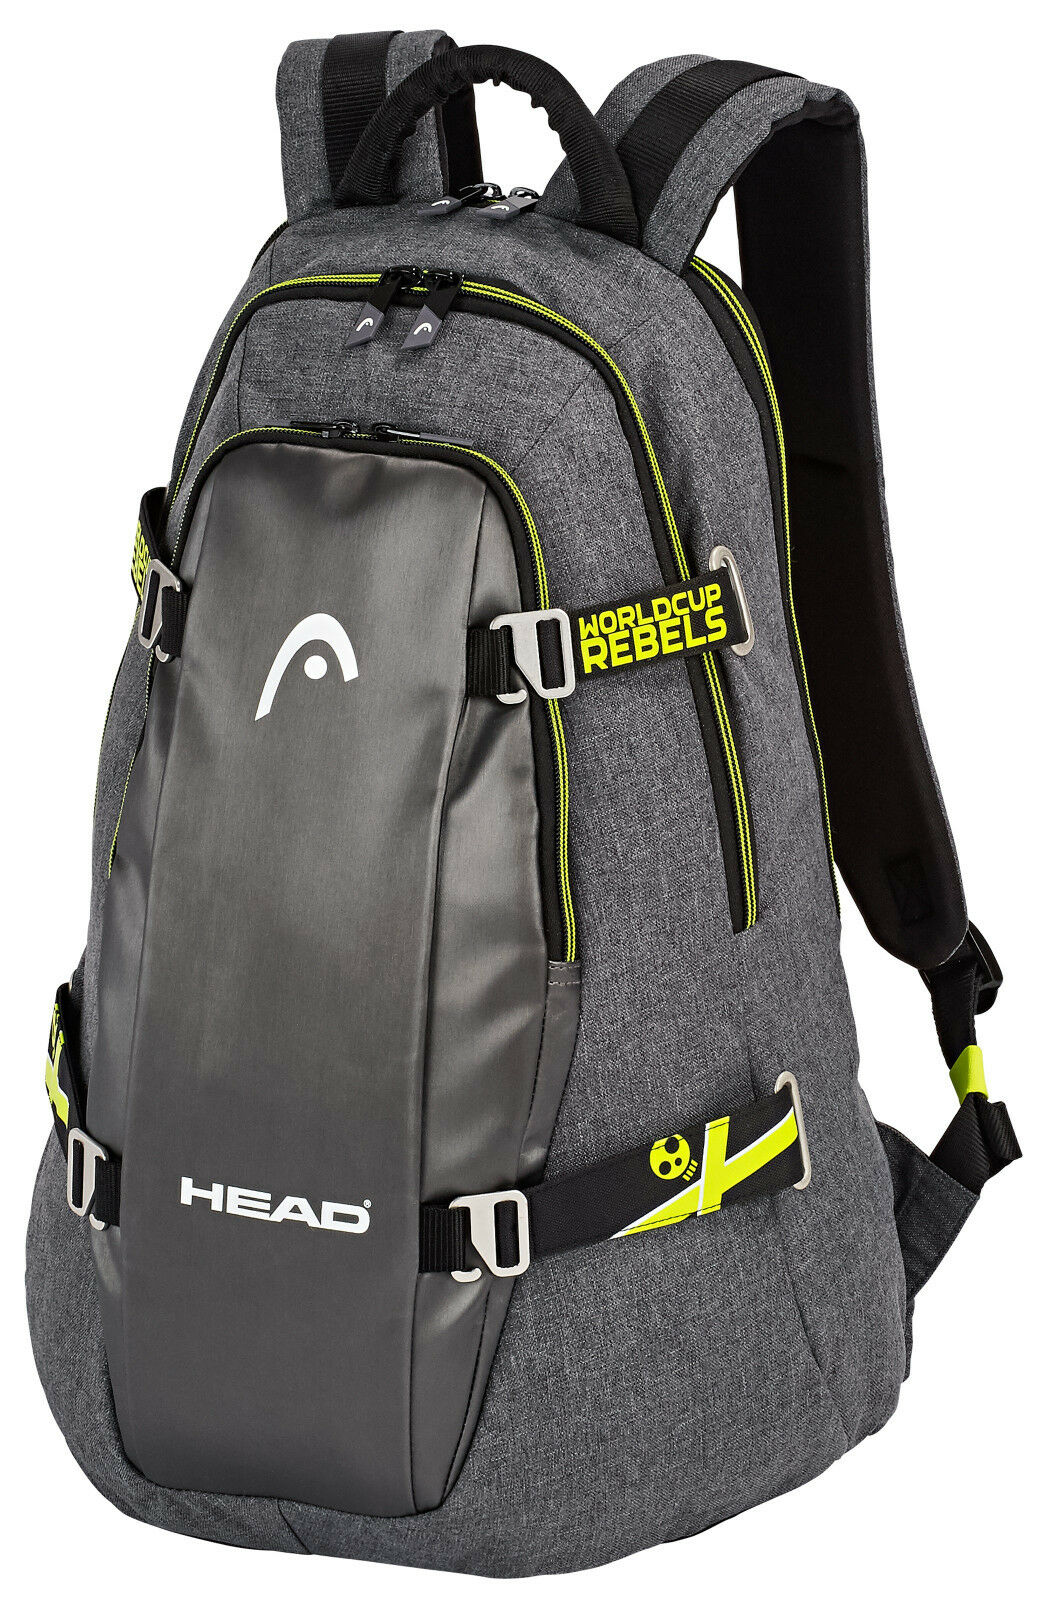 HEAD Rebels Backpack Skirucksack Collection 2019 NEU